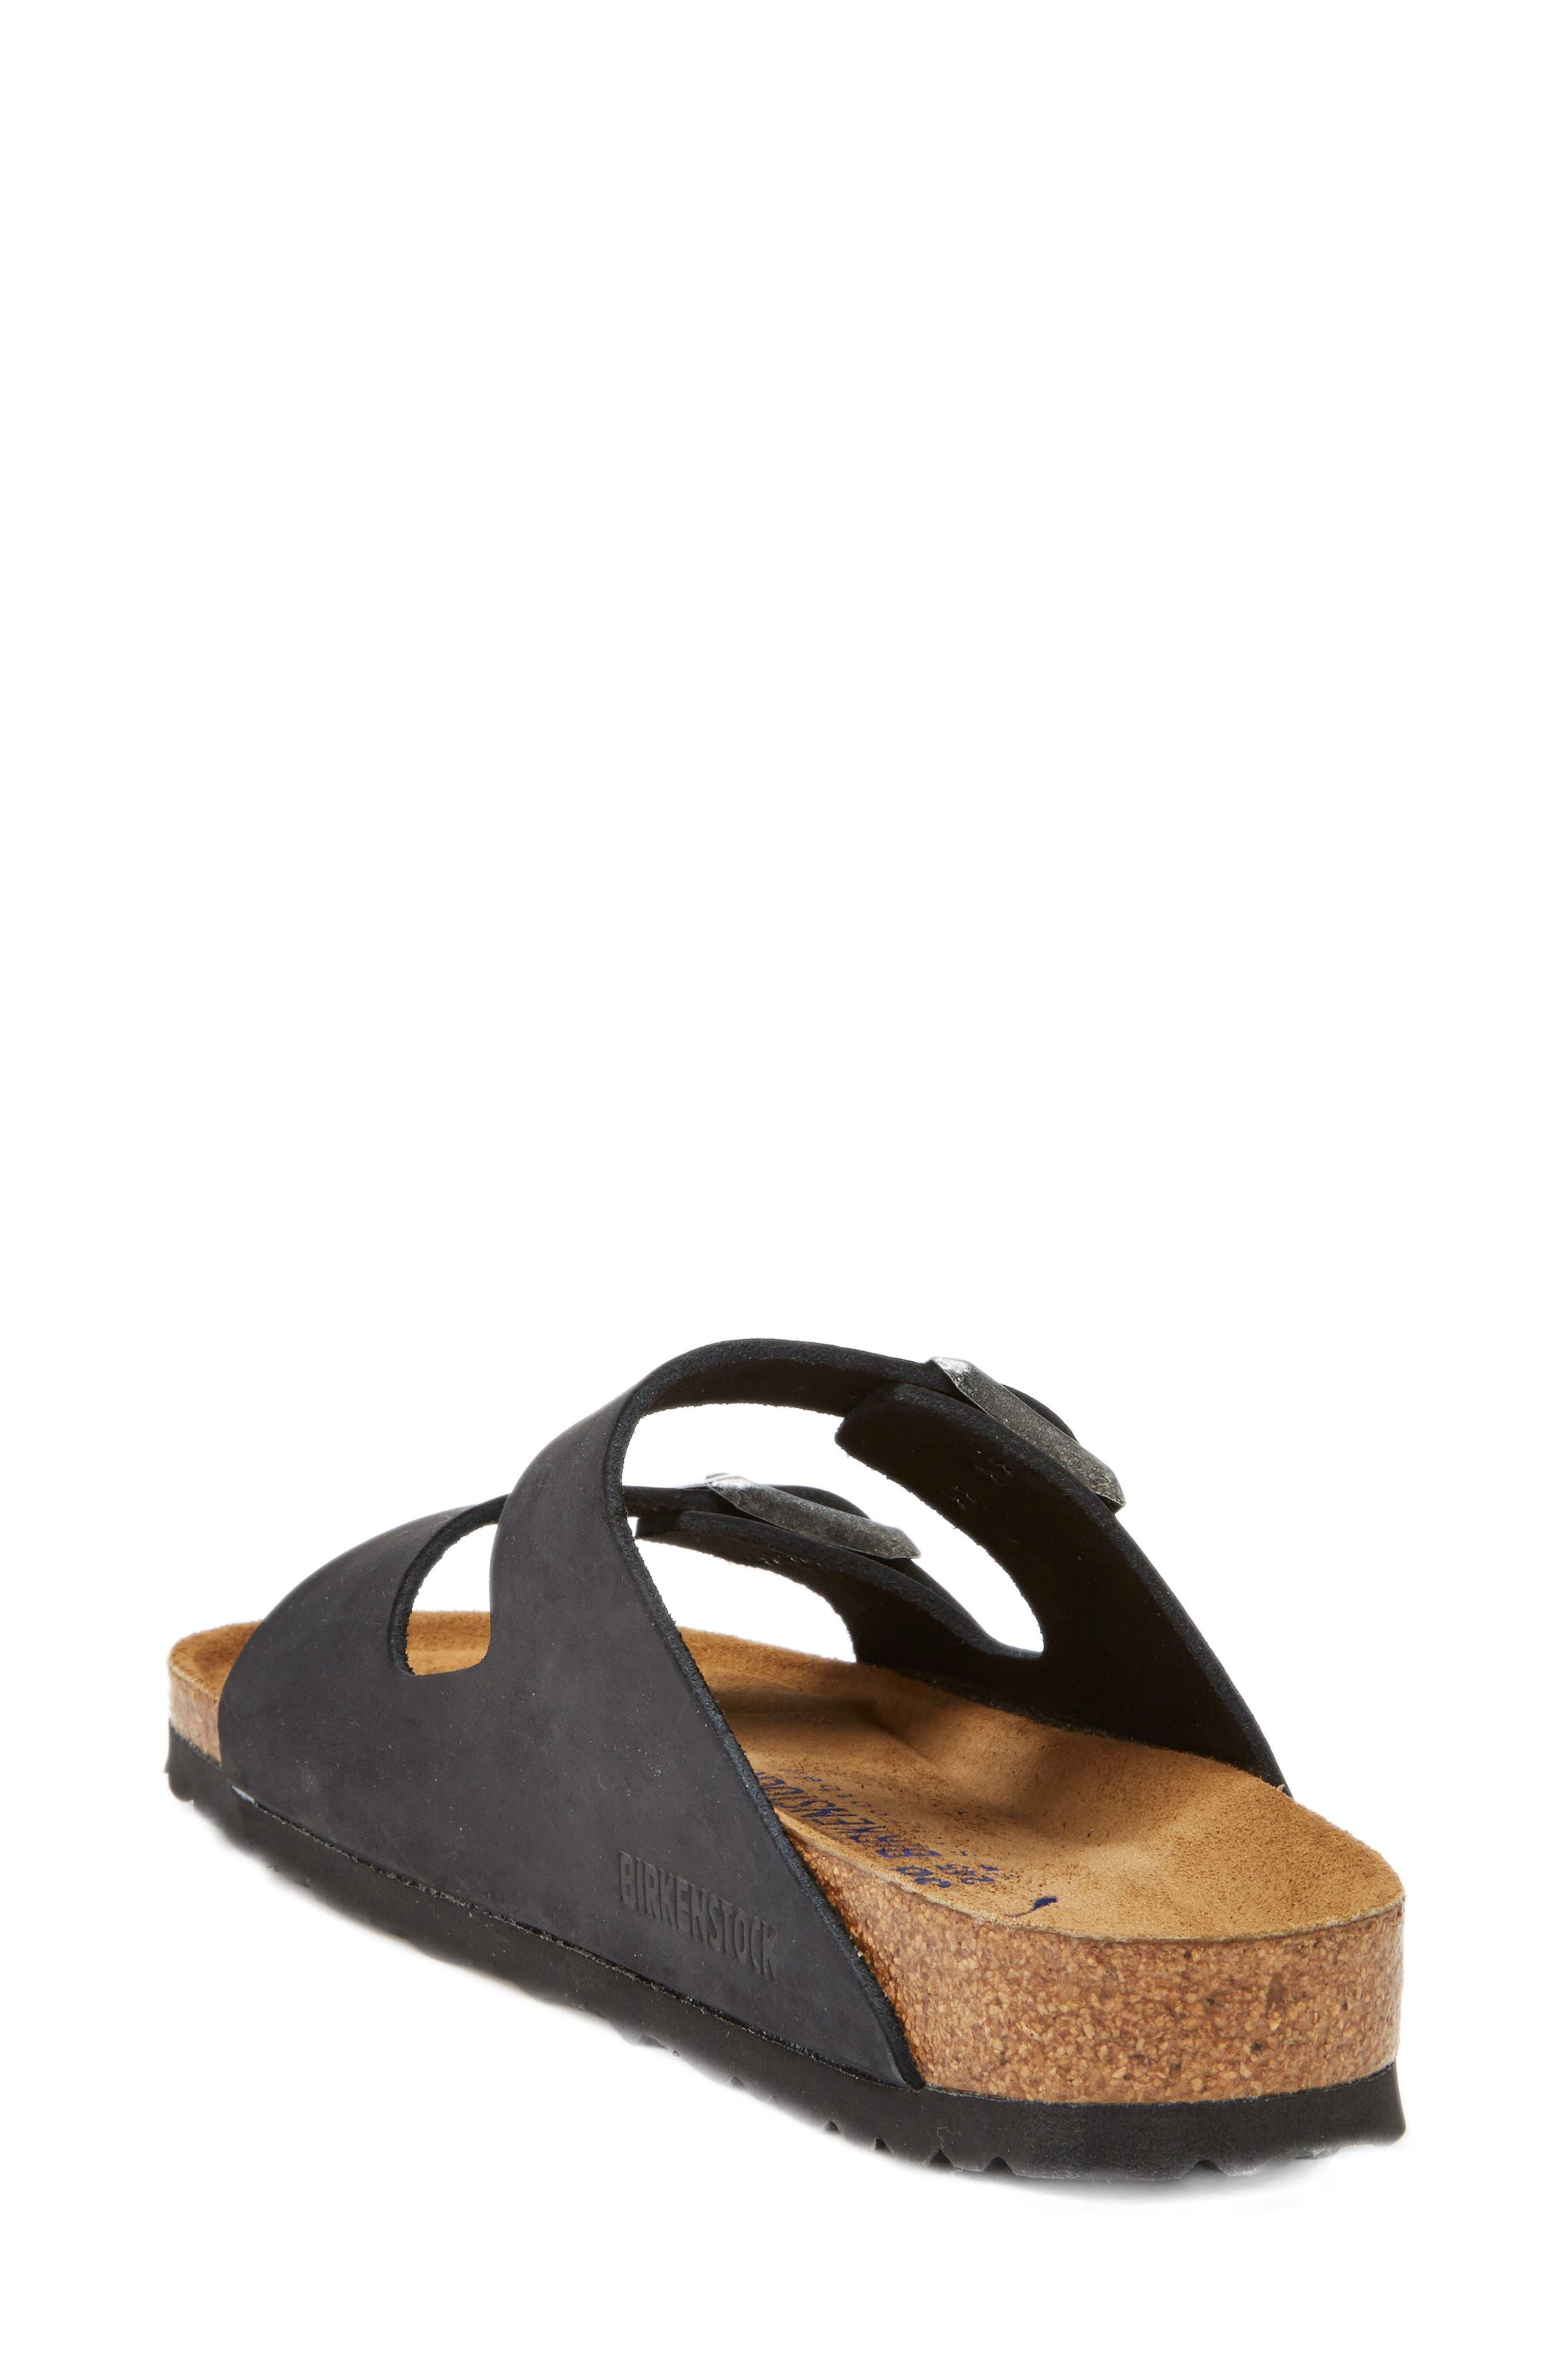 BIRKENSTOCK, Arizona Soft Footbed Sandal, Alternate thumbnail 2, color, BLACK/ BLACK